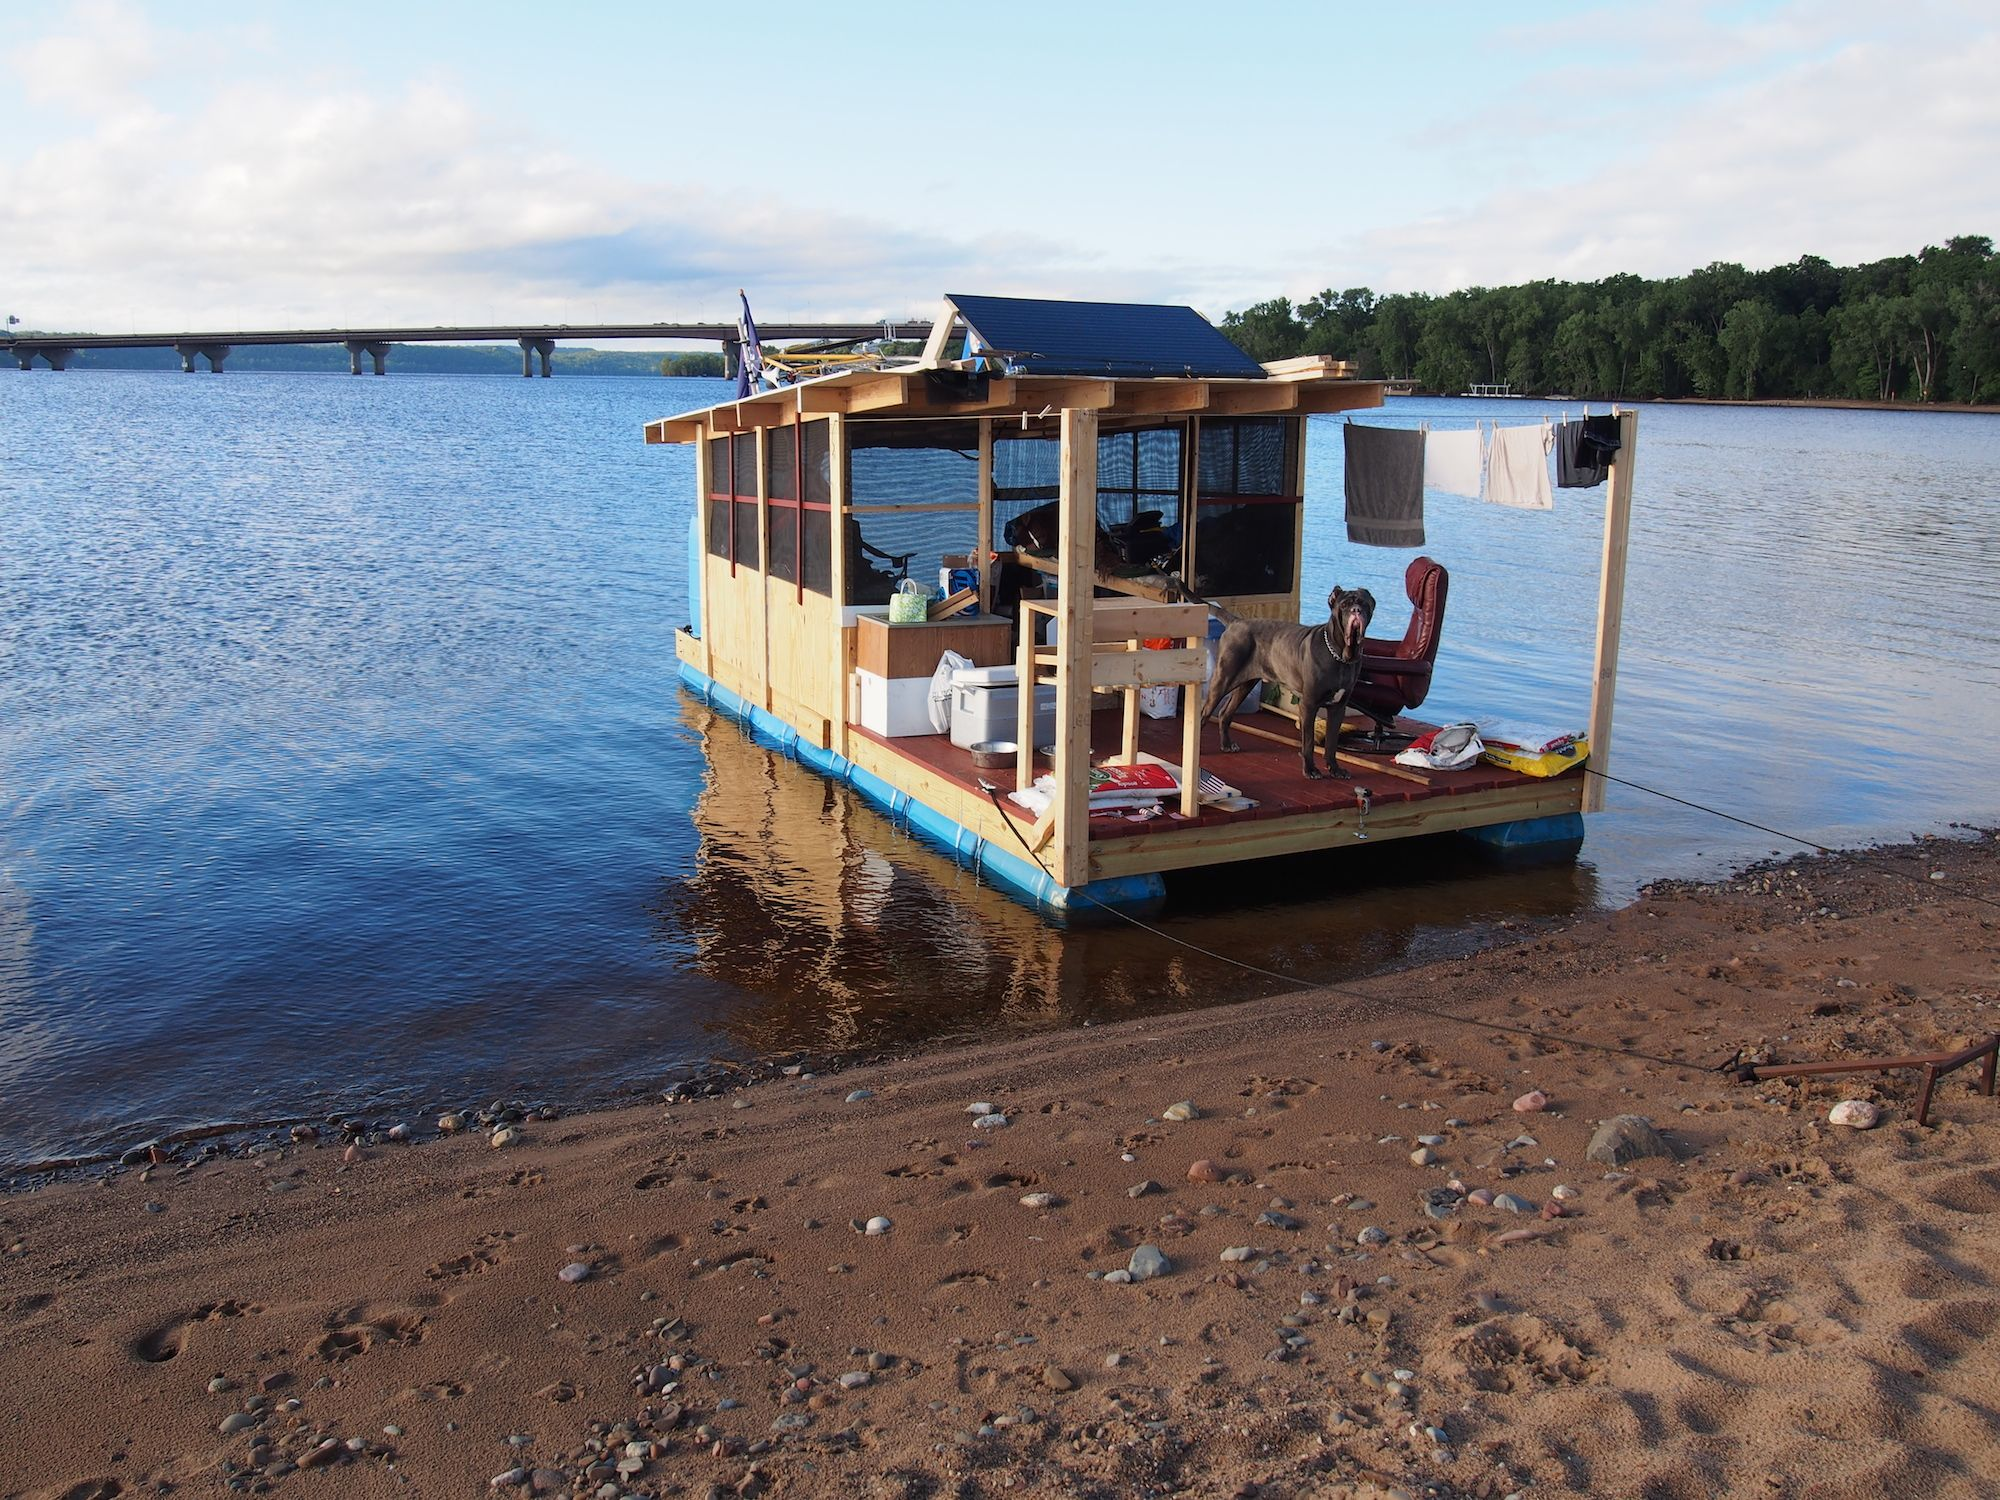 The Raft Shanty Boat Pontoon Houseboat Raft Boat